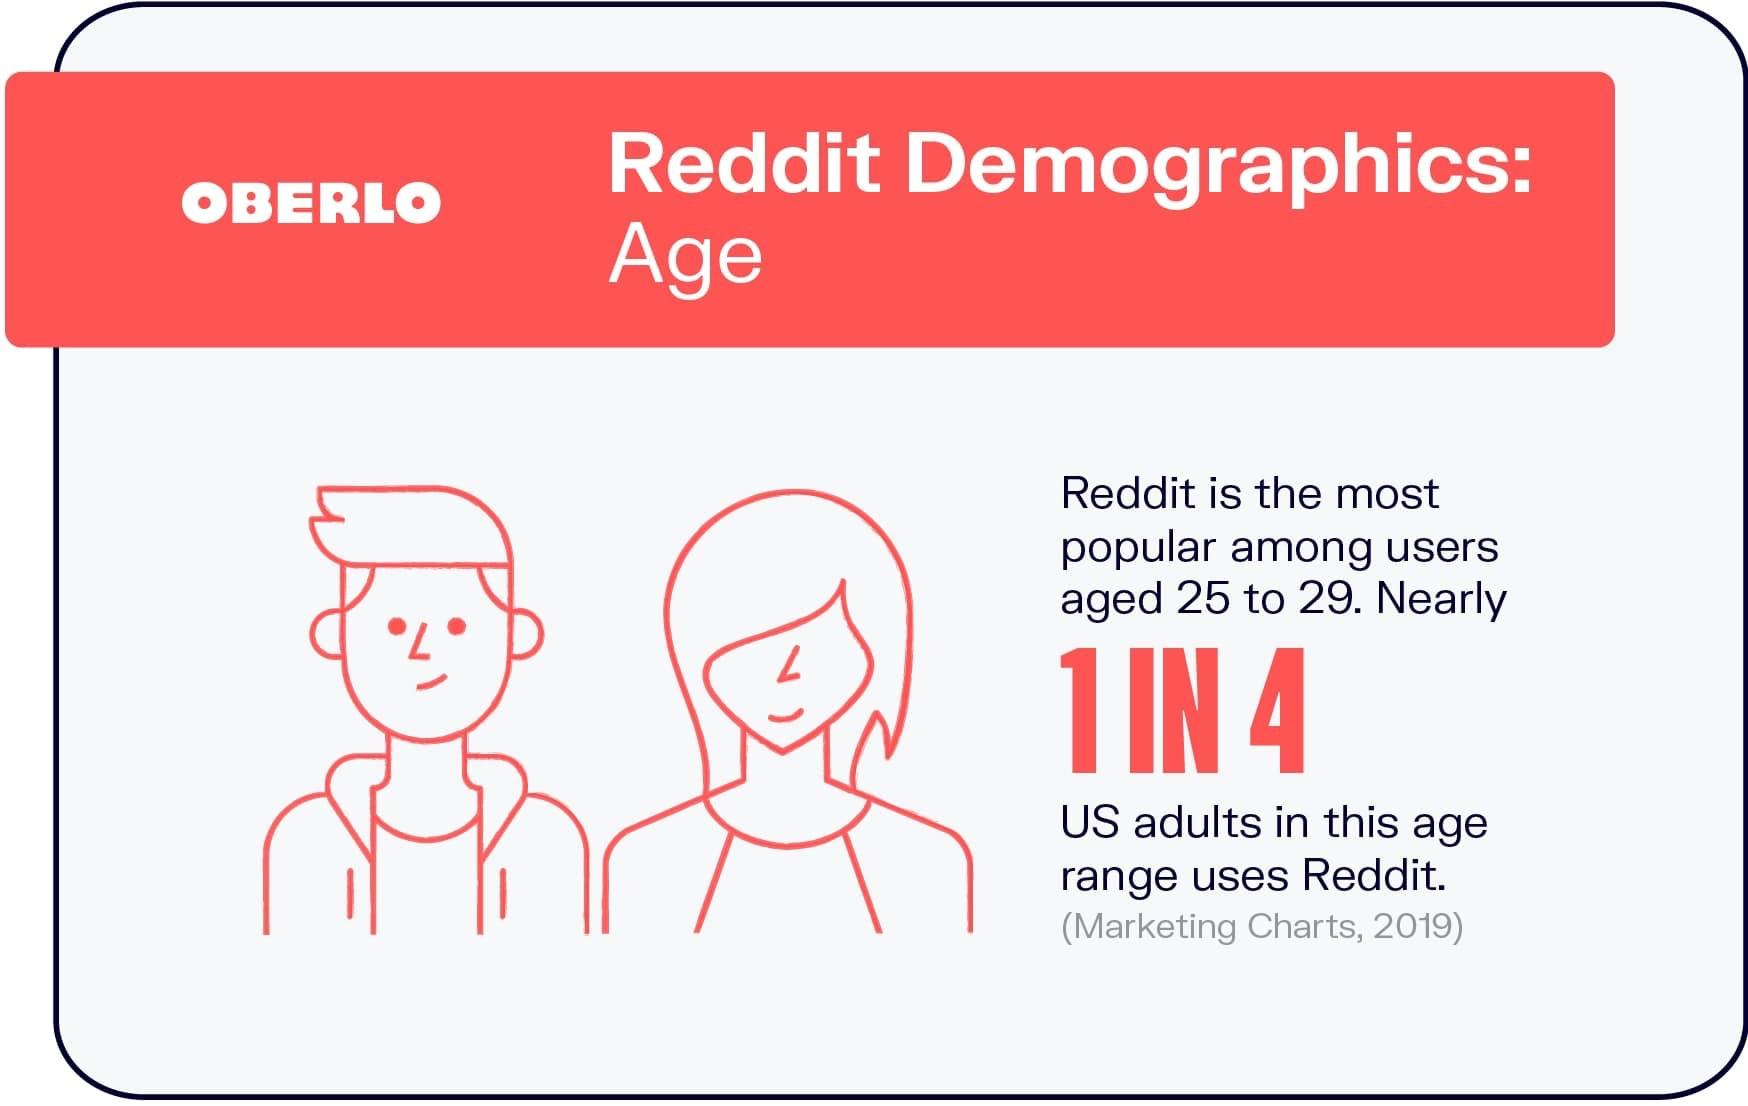 Reddit Demographics: Age